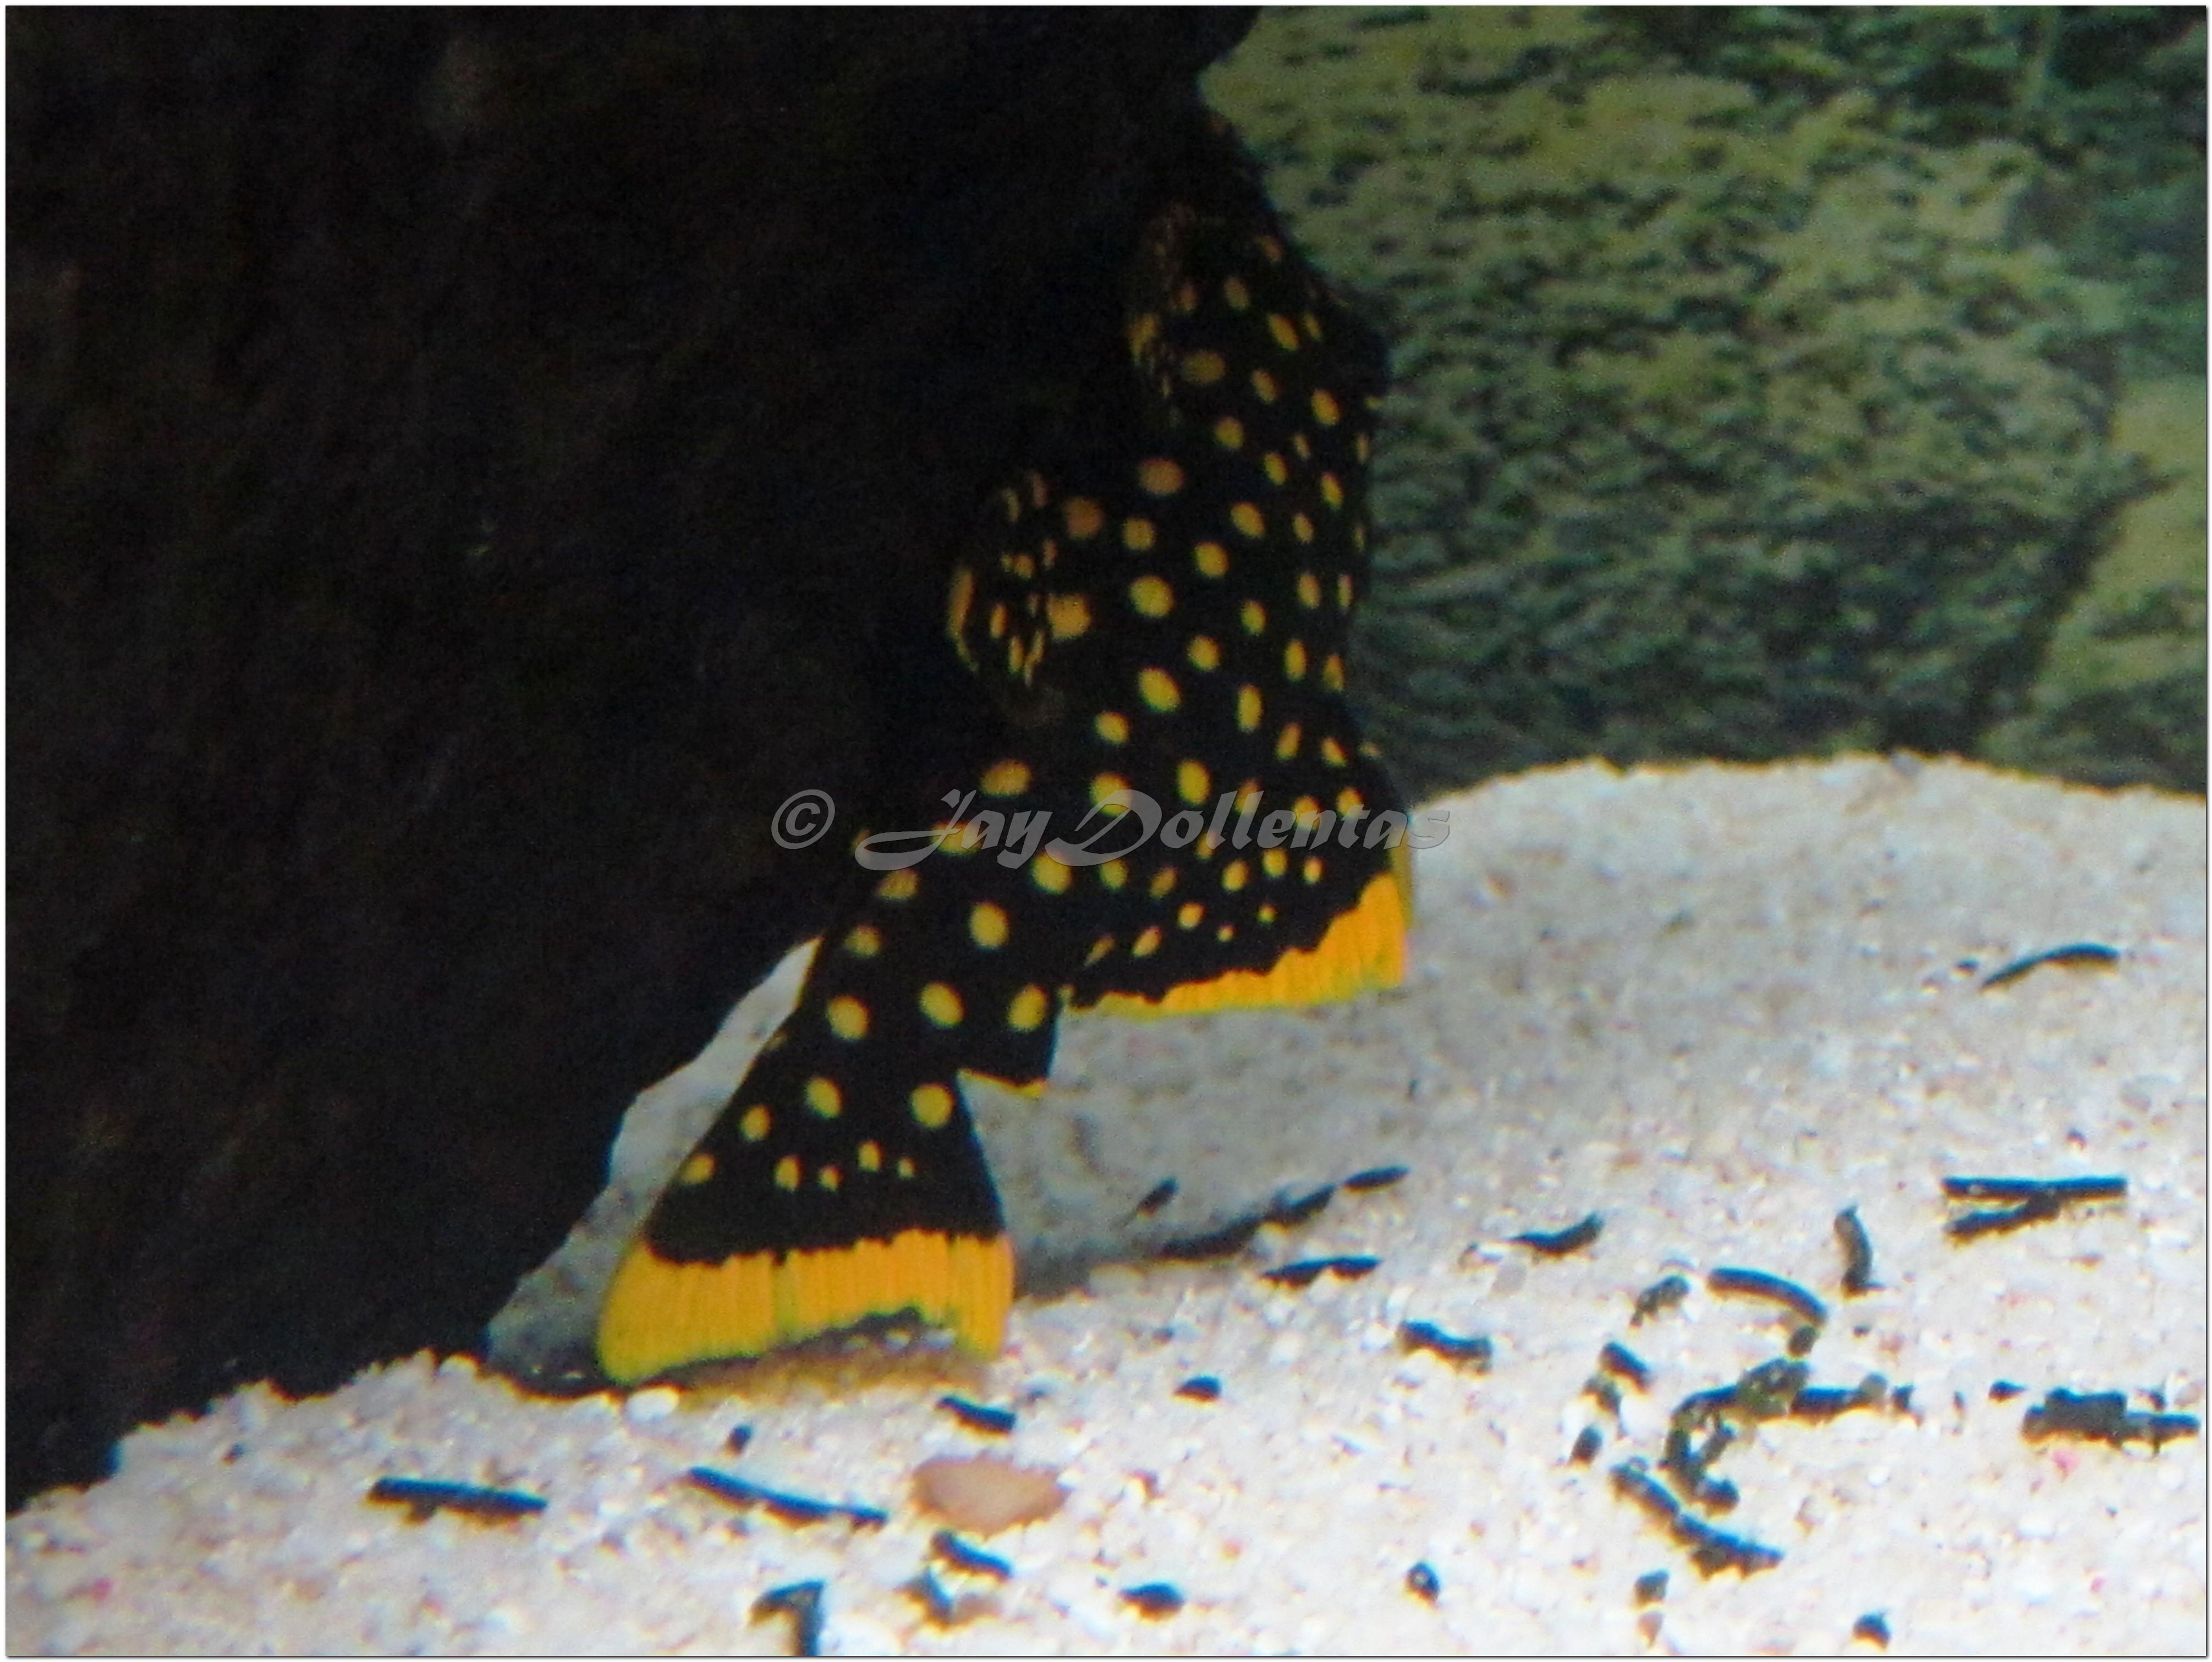 cichlids.com: L177 Gold Nugget Pleco